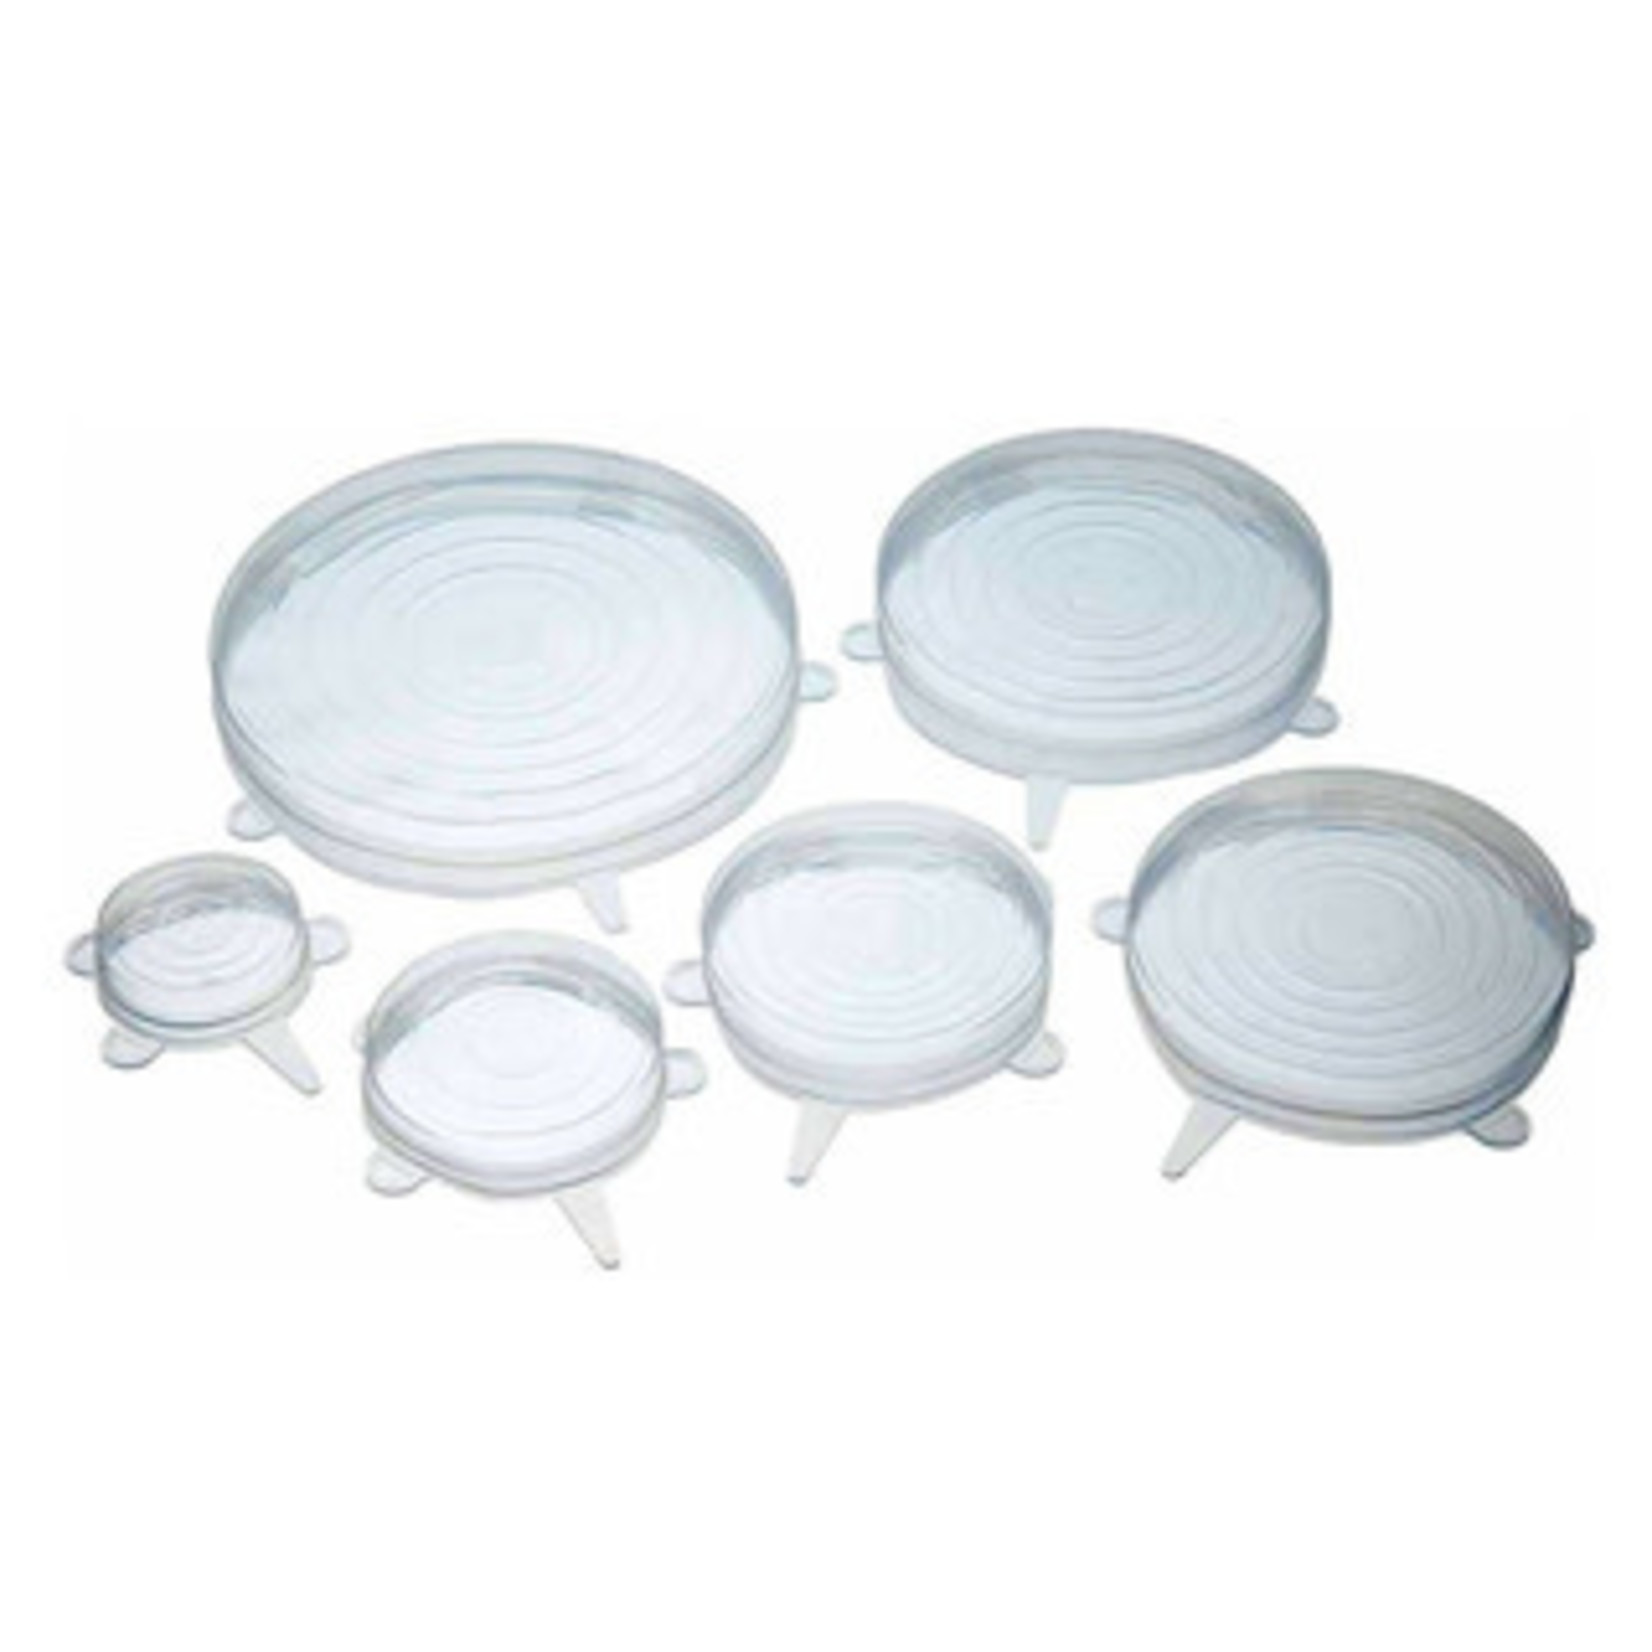 Kitchencraft Afsluitdeksels siliconen set van 6